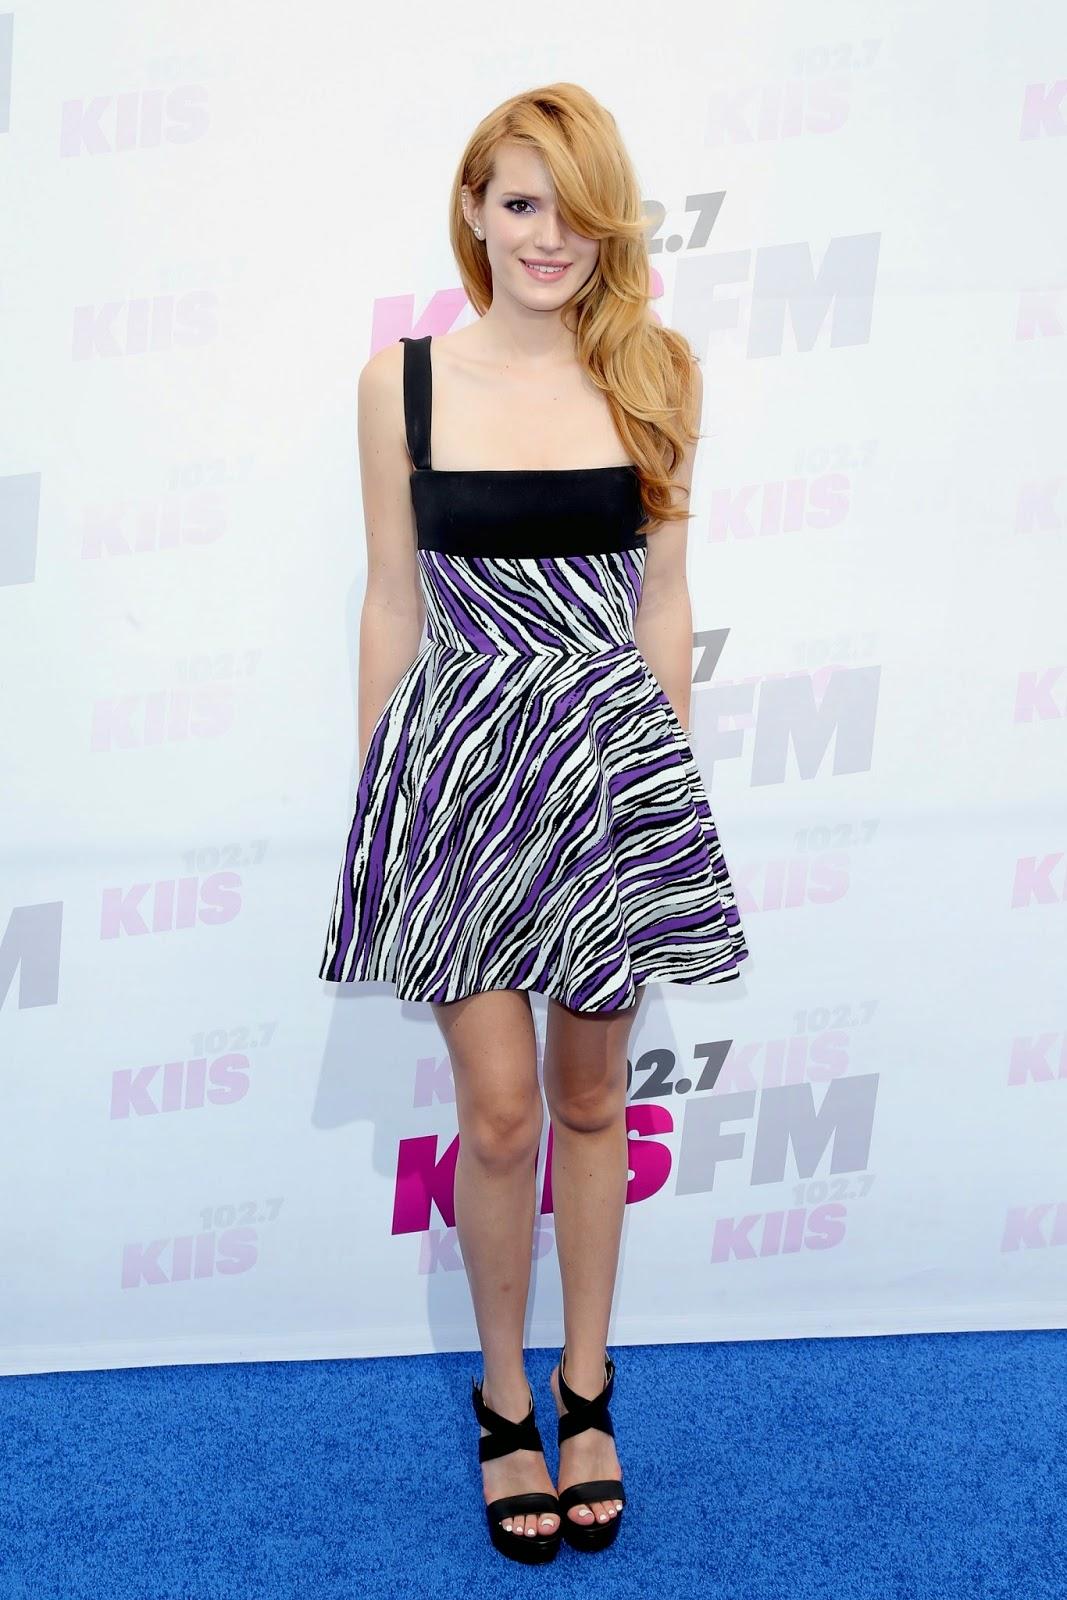 Hot Photos of Bella Thorne.